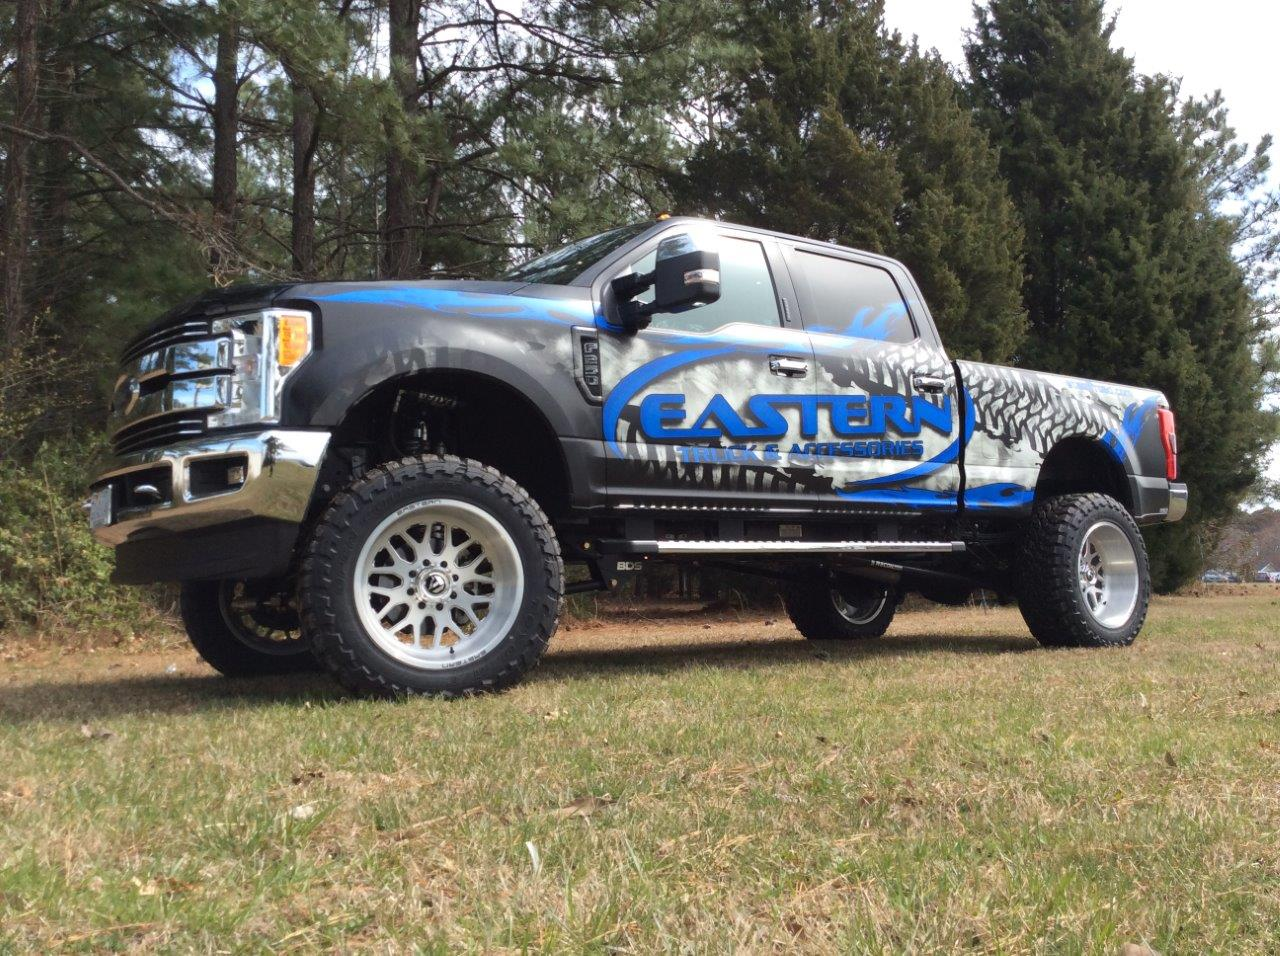 Virginia Beach Truck Lift Kits Located in Norfolk - Eastern